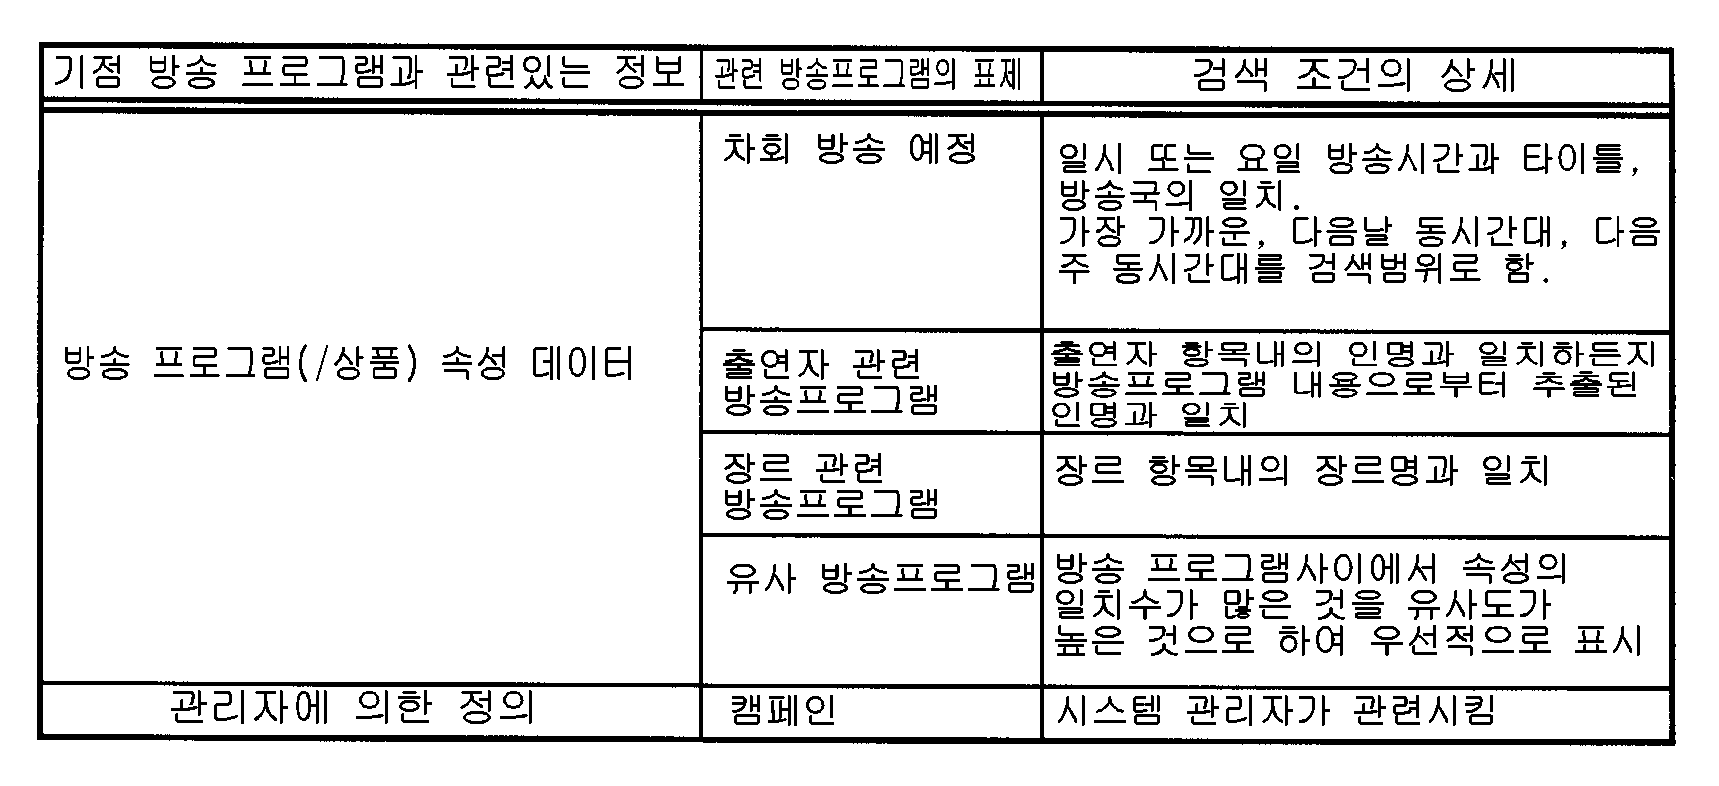 Figure 112005002982684-pct00001